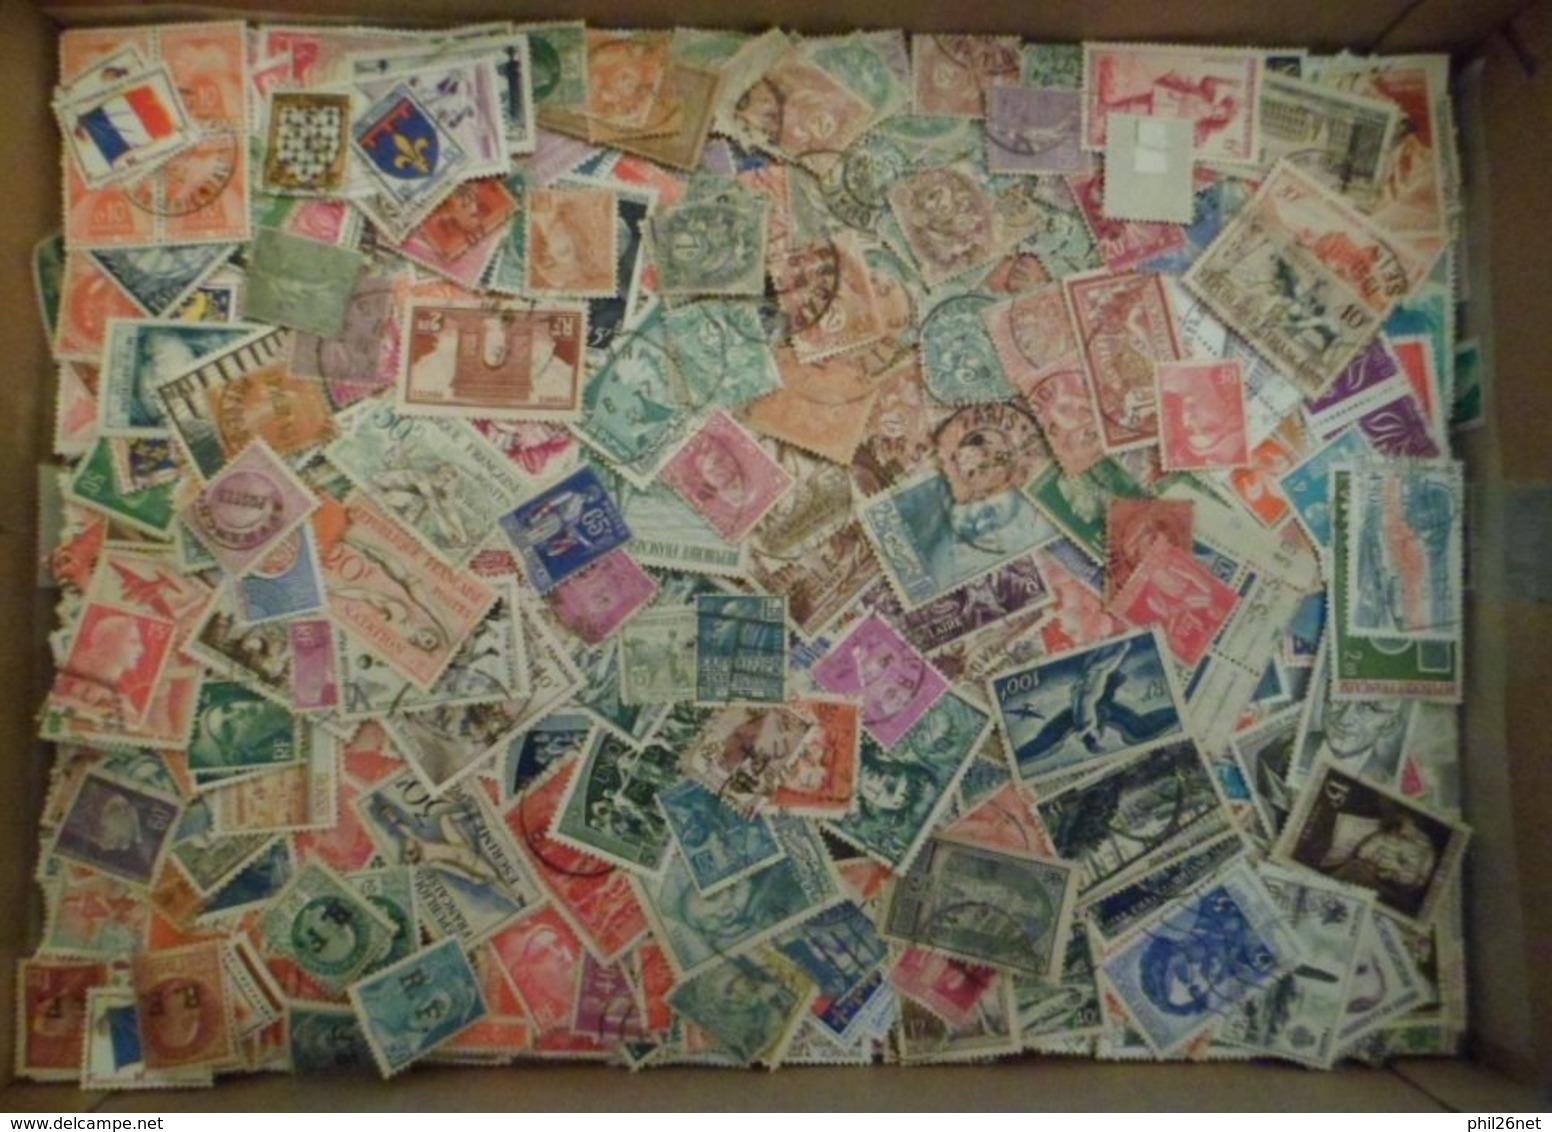 Lot Exceptionnel 50 000 Euros Cote Garantie  150 000 Problable 60 Ans D'accumulation Monde Entier  * * / */(*) O   B/TB - Timbres